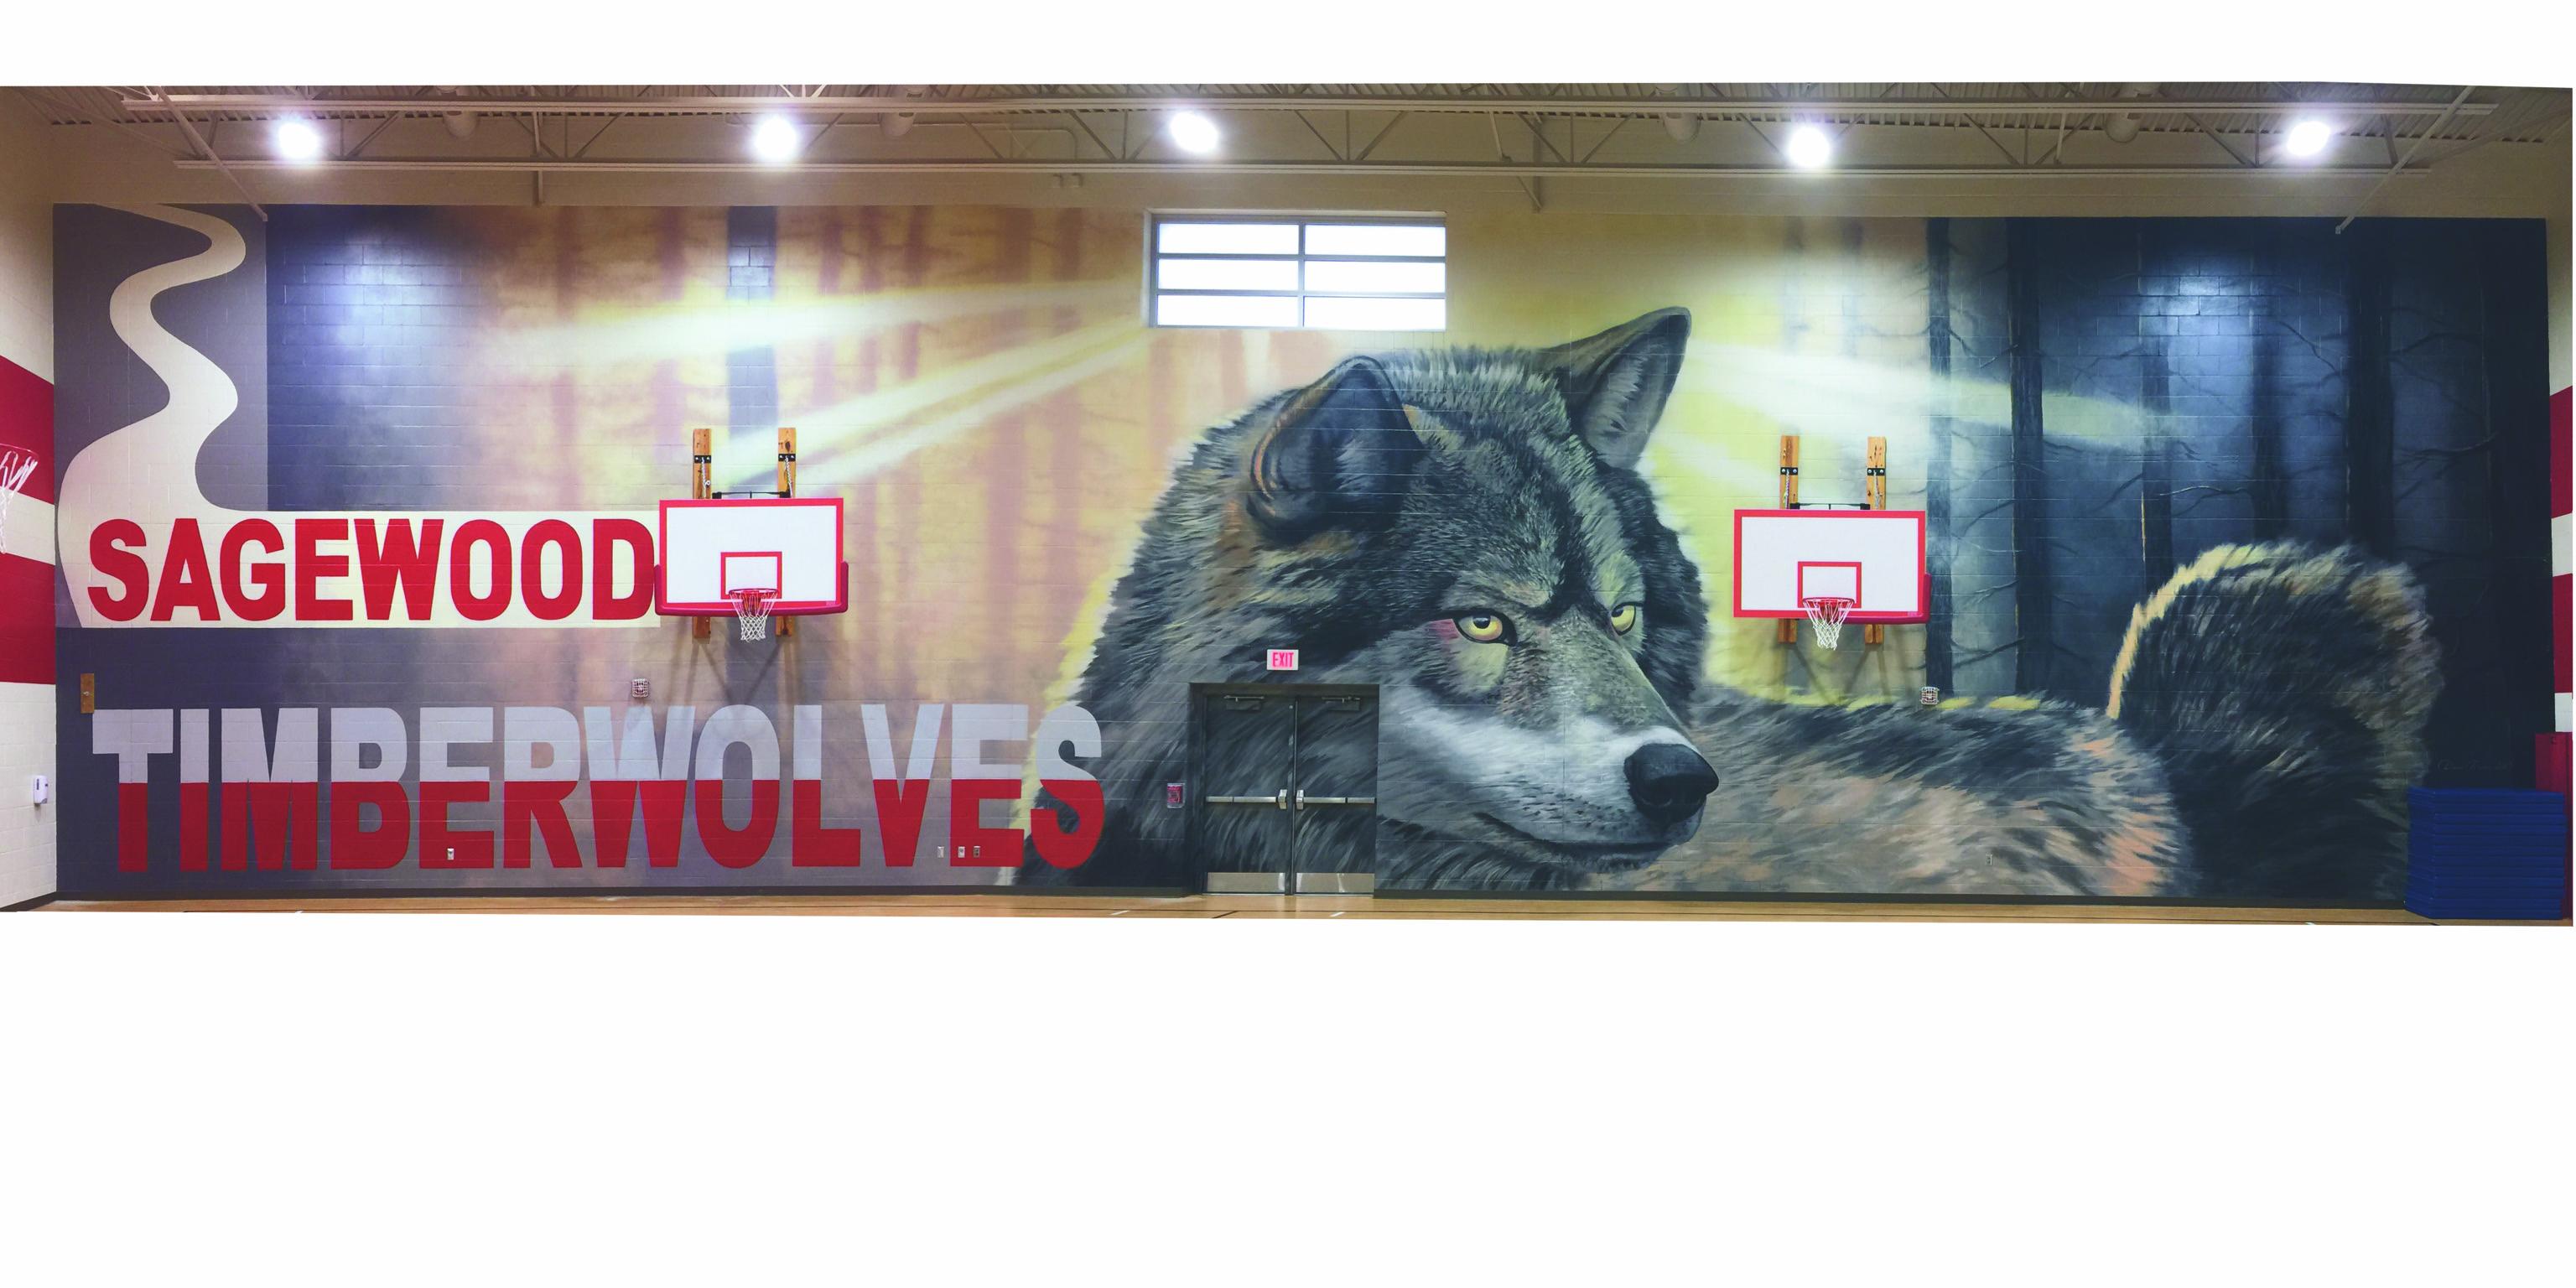 Sagewood Timberwolves